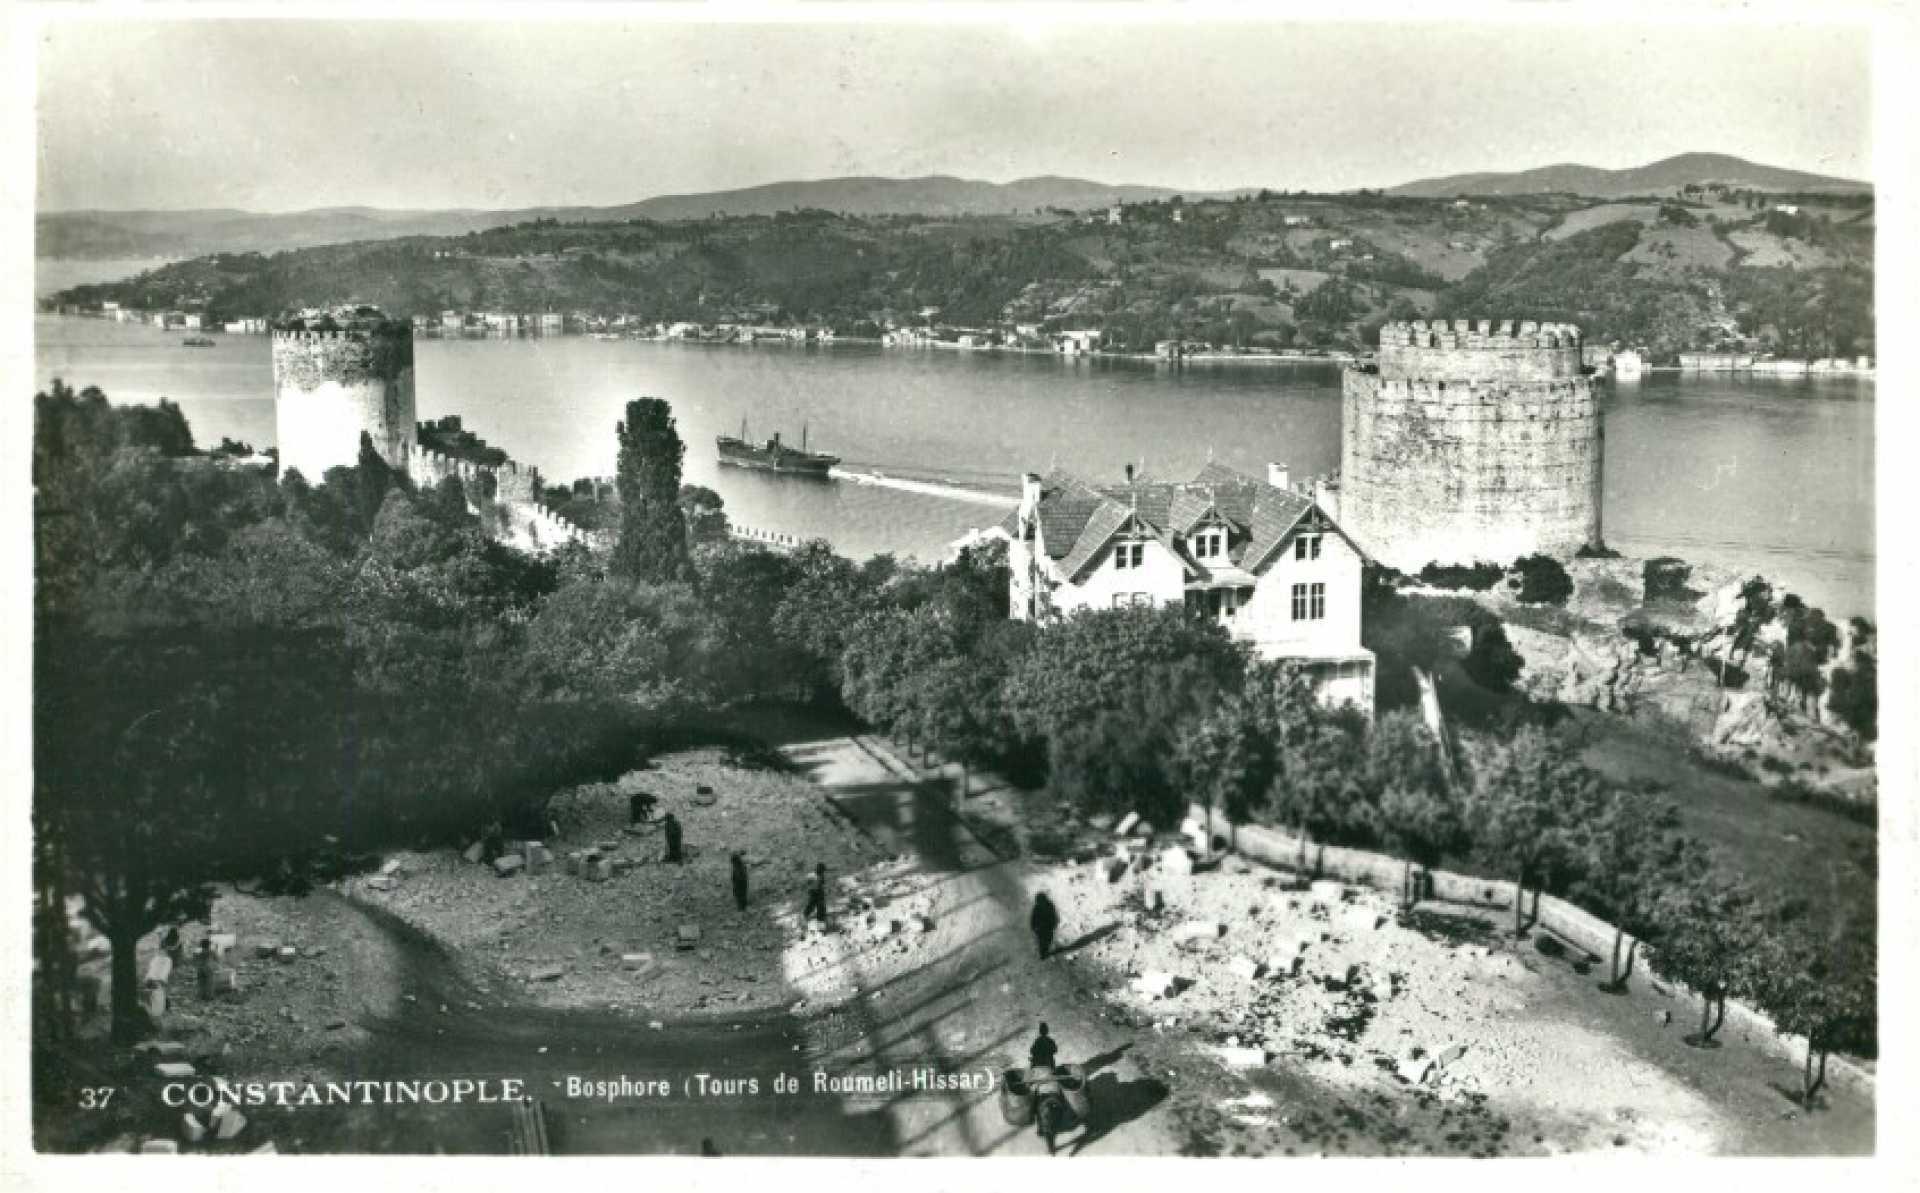 Bosphore. Tours de Roumeli-Hissar